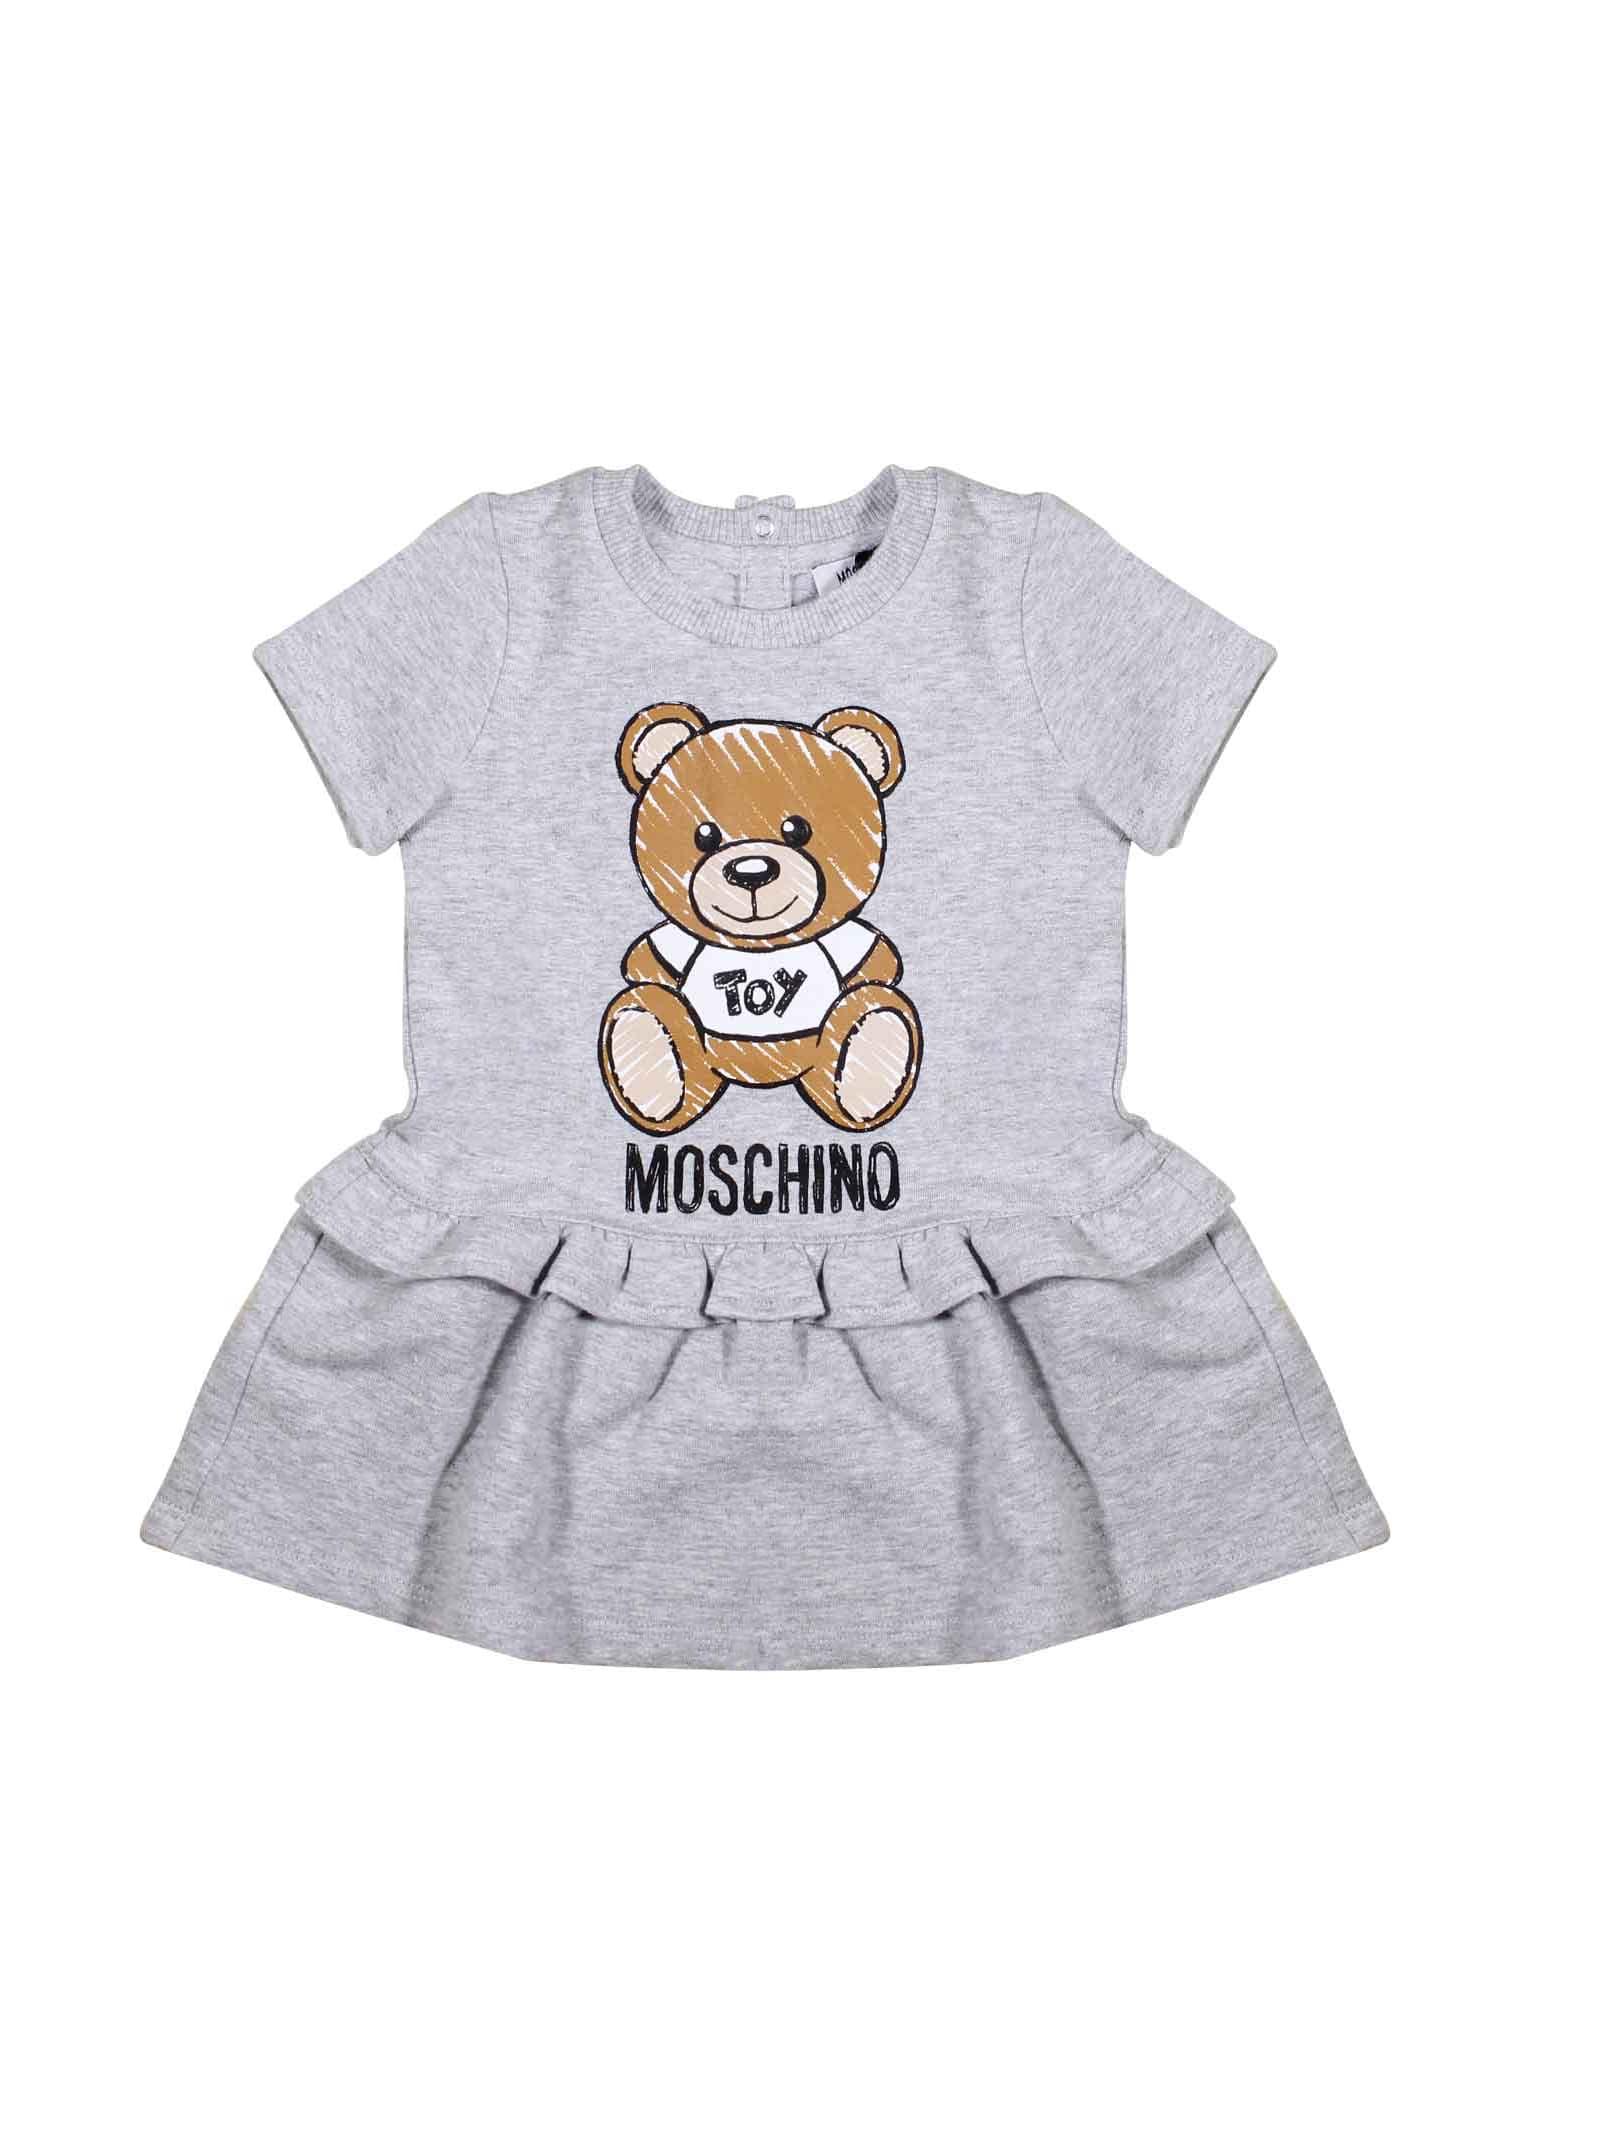 Moschino Grey Short-sleeved Dress For Girl